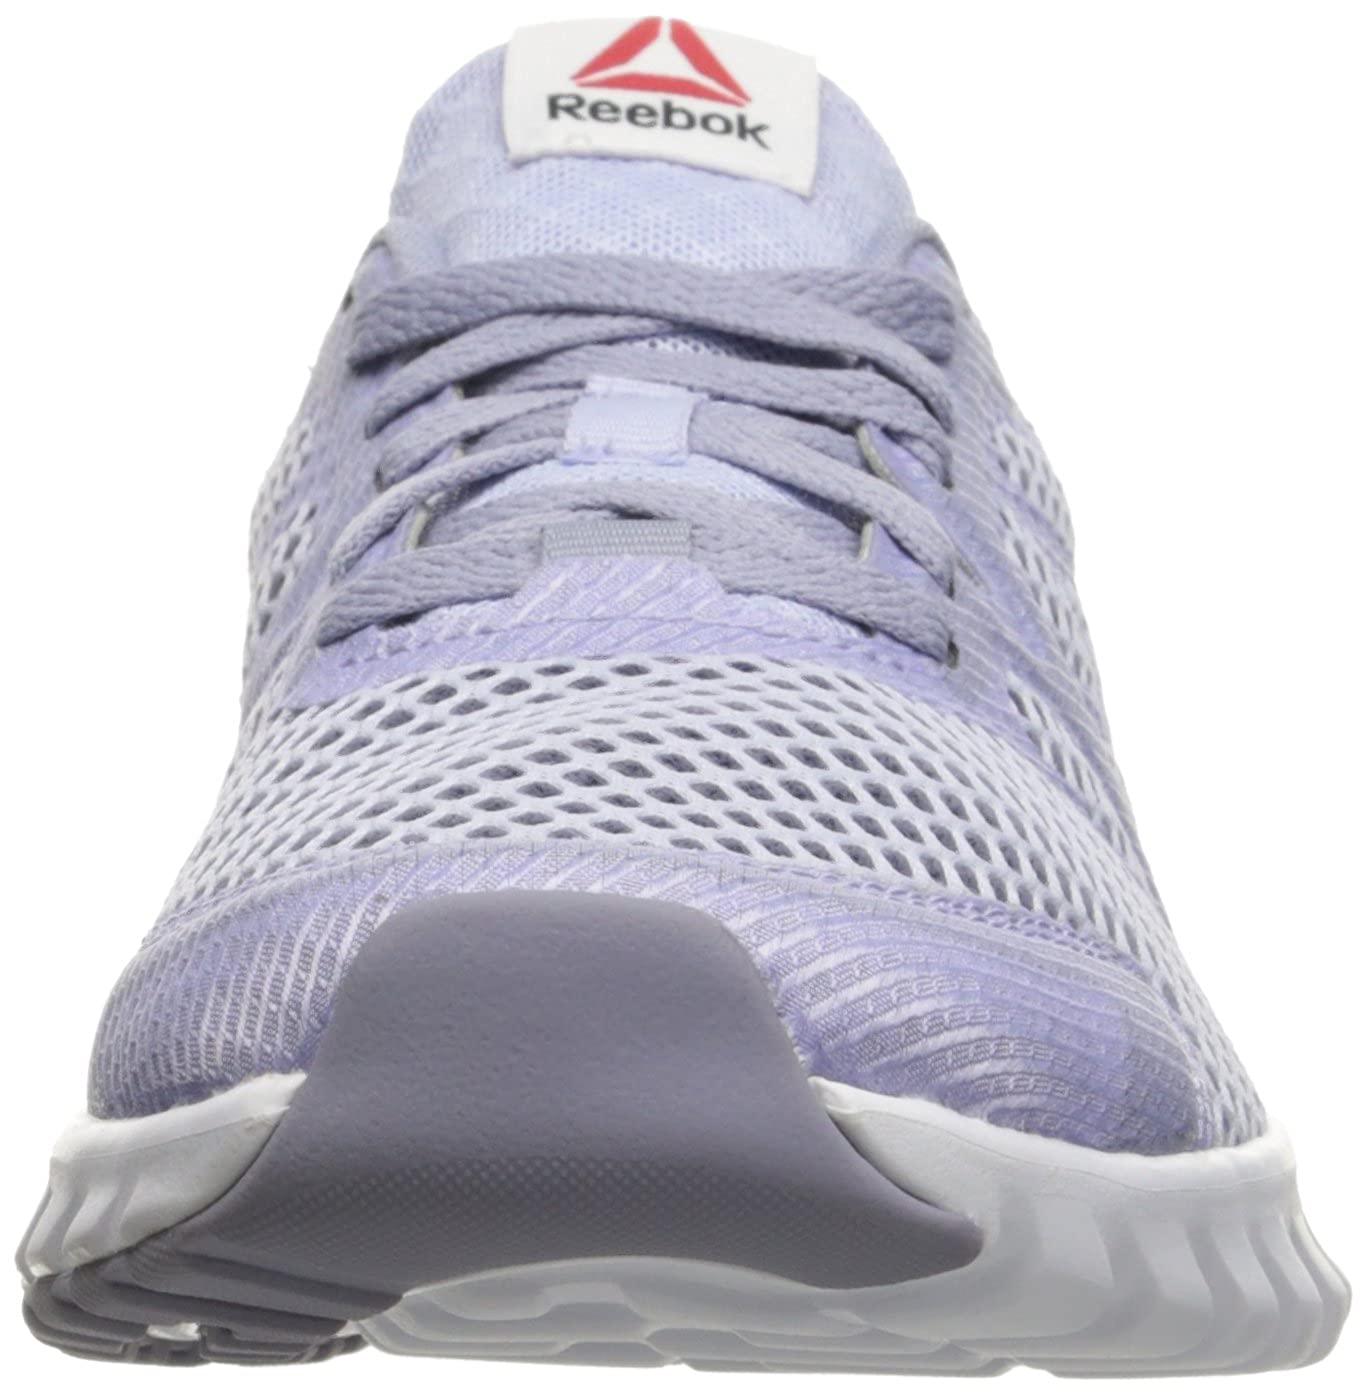 Reebok Women s Twistform Blaze 2.0 MU Mtm running Shoe